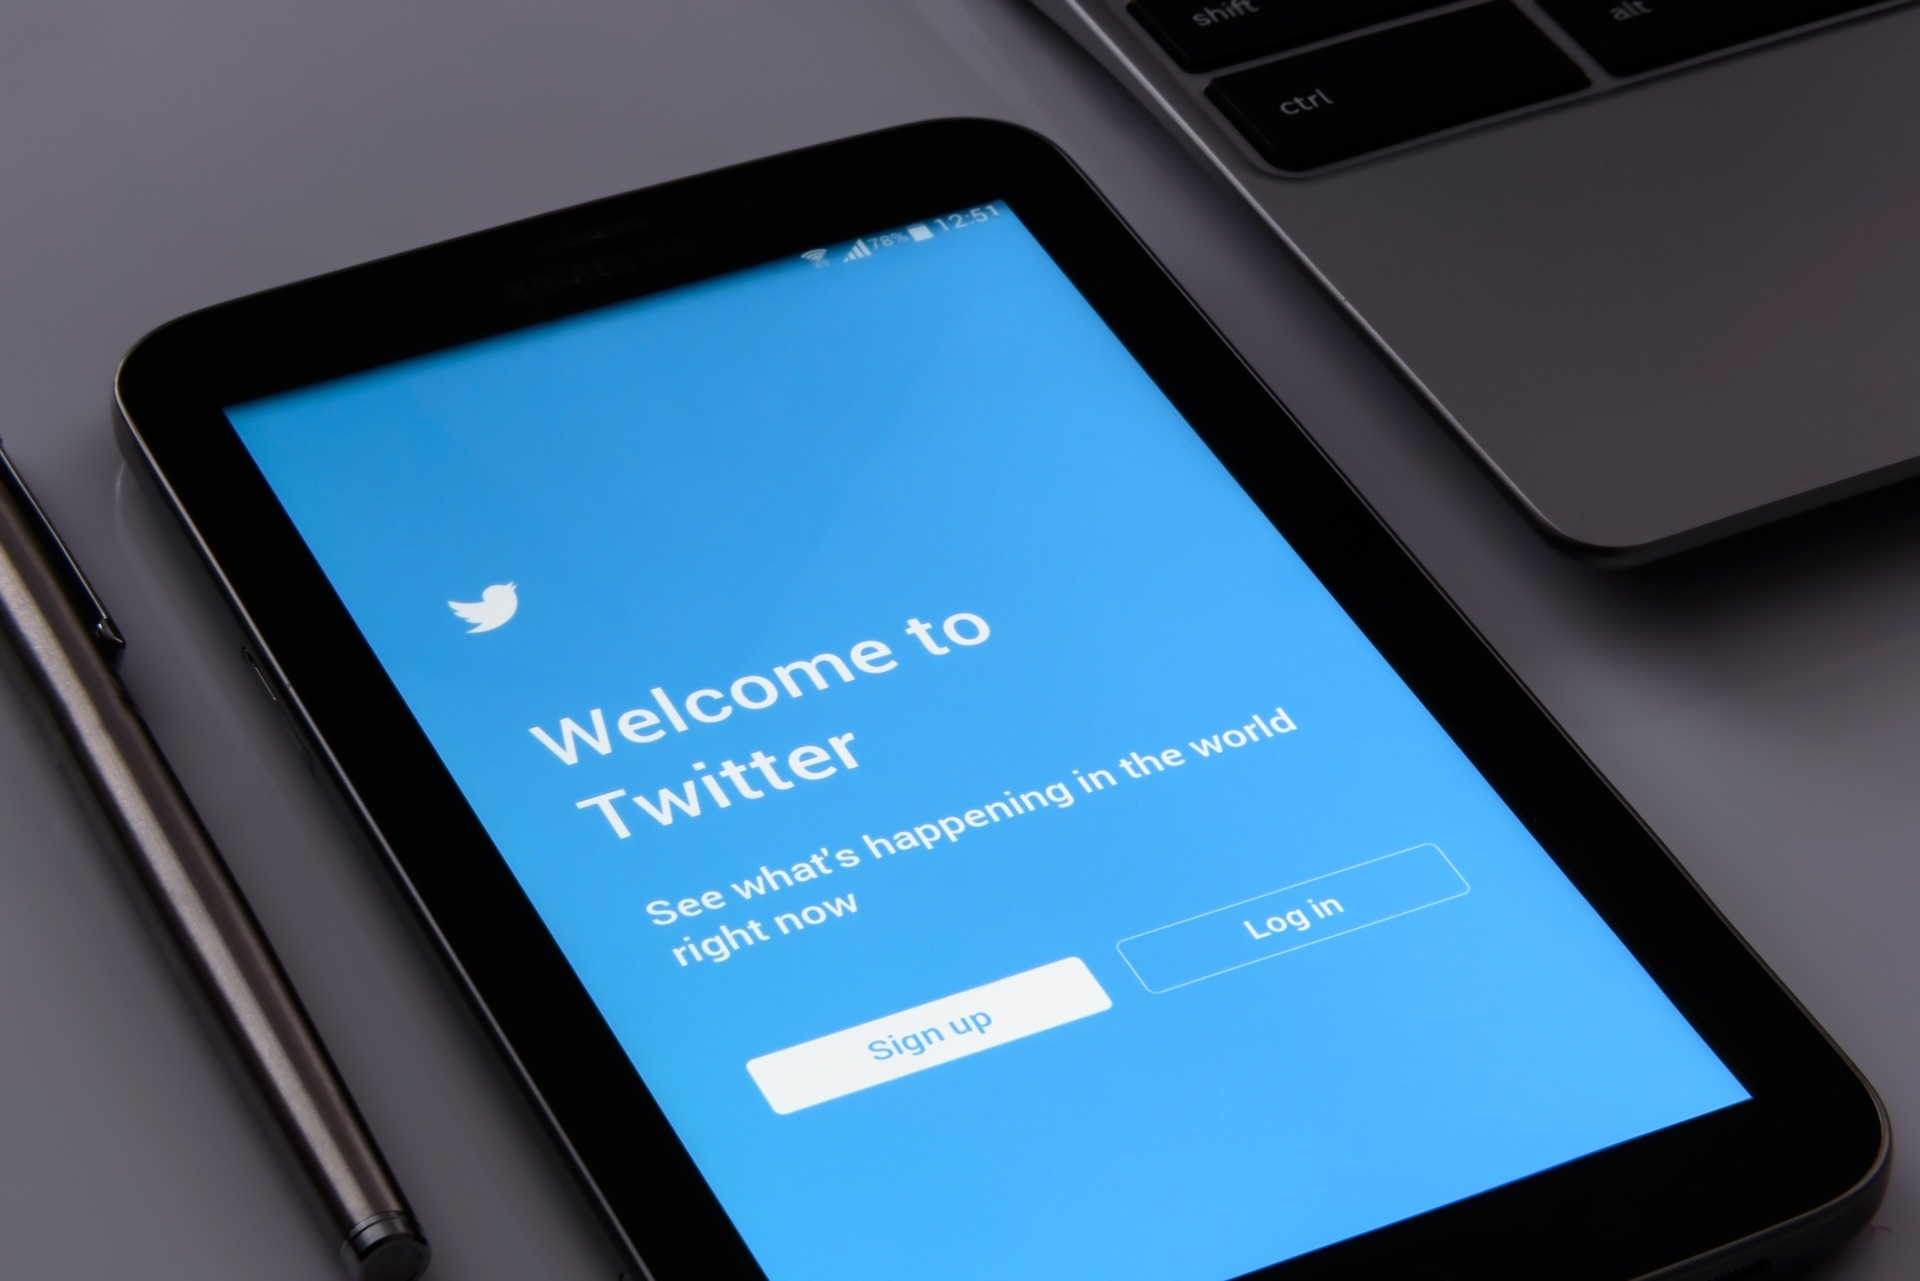 Like, Retweet, and Quote Tweet: Understanding the Twitterverse